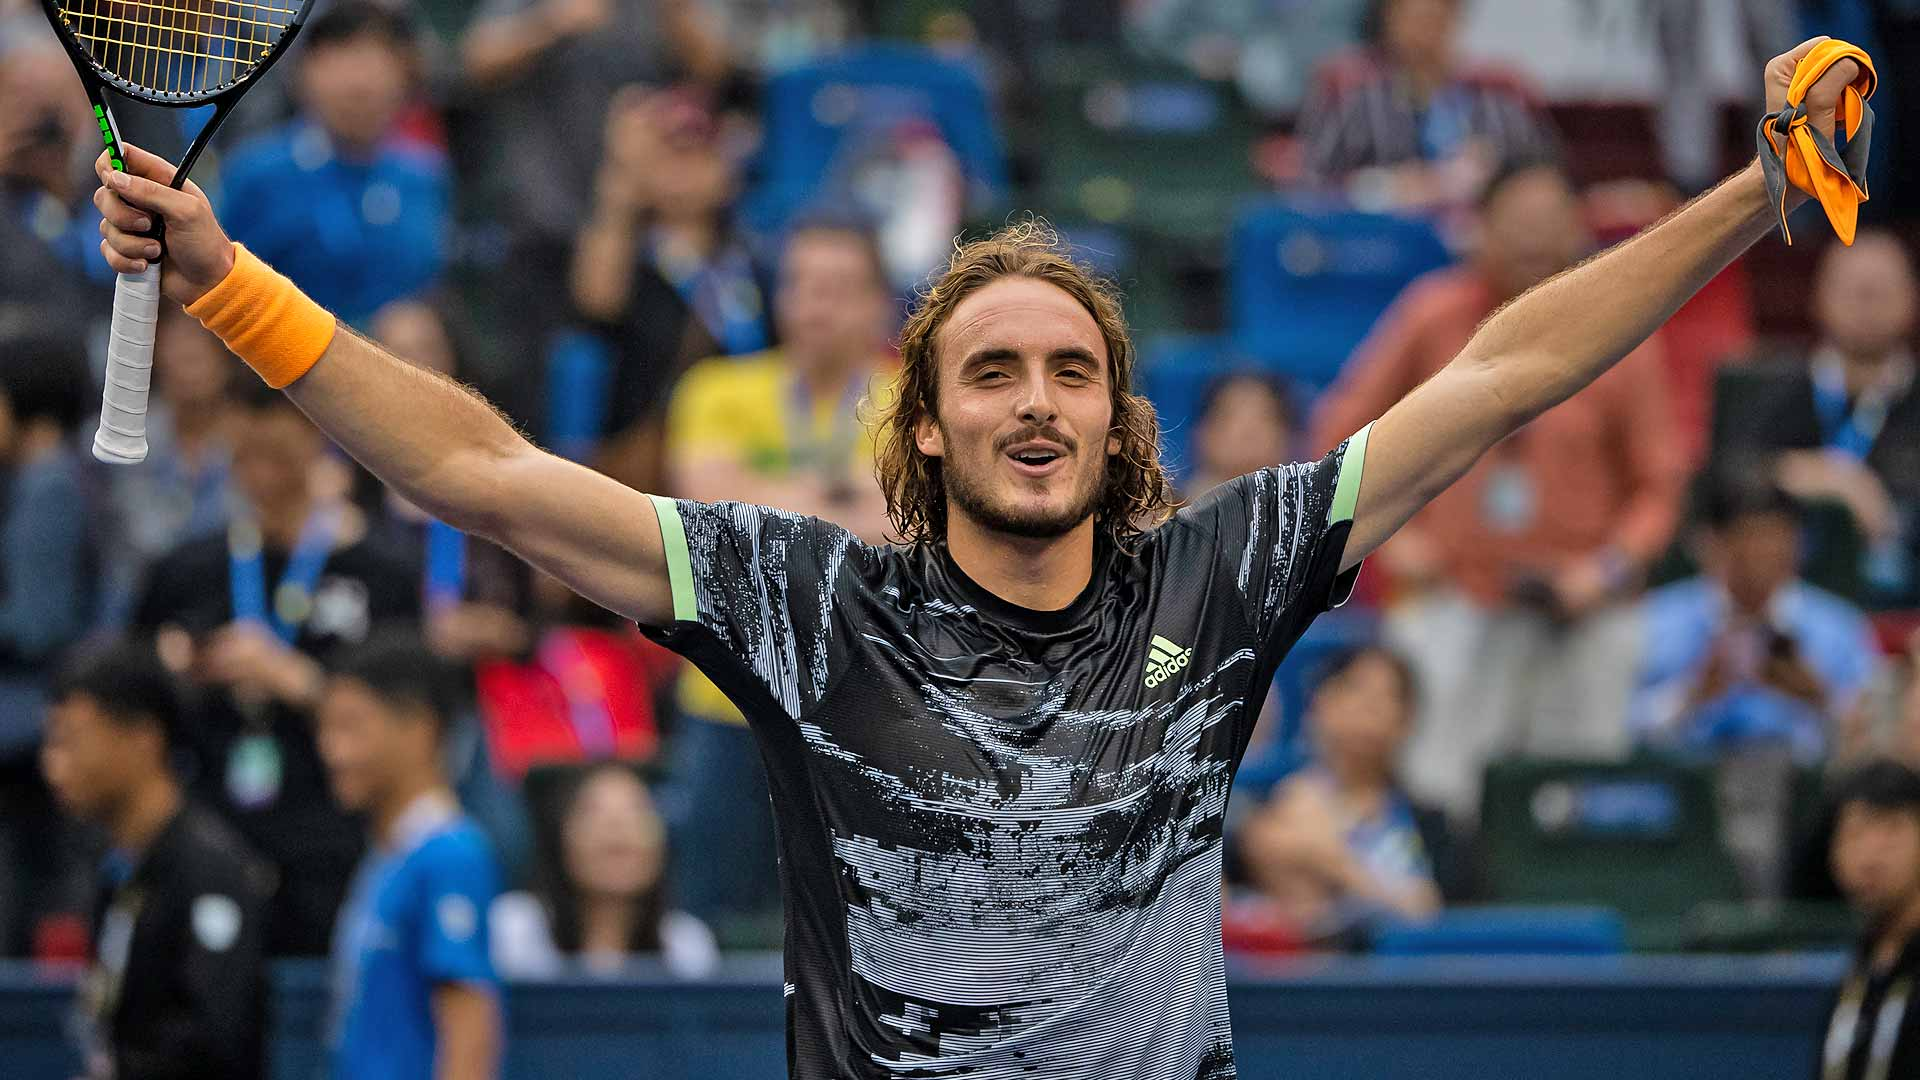 Nitto ATP Finals: Stefanos Tsitsipas